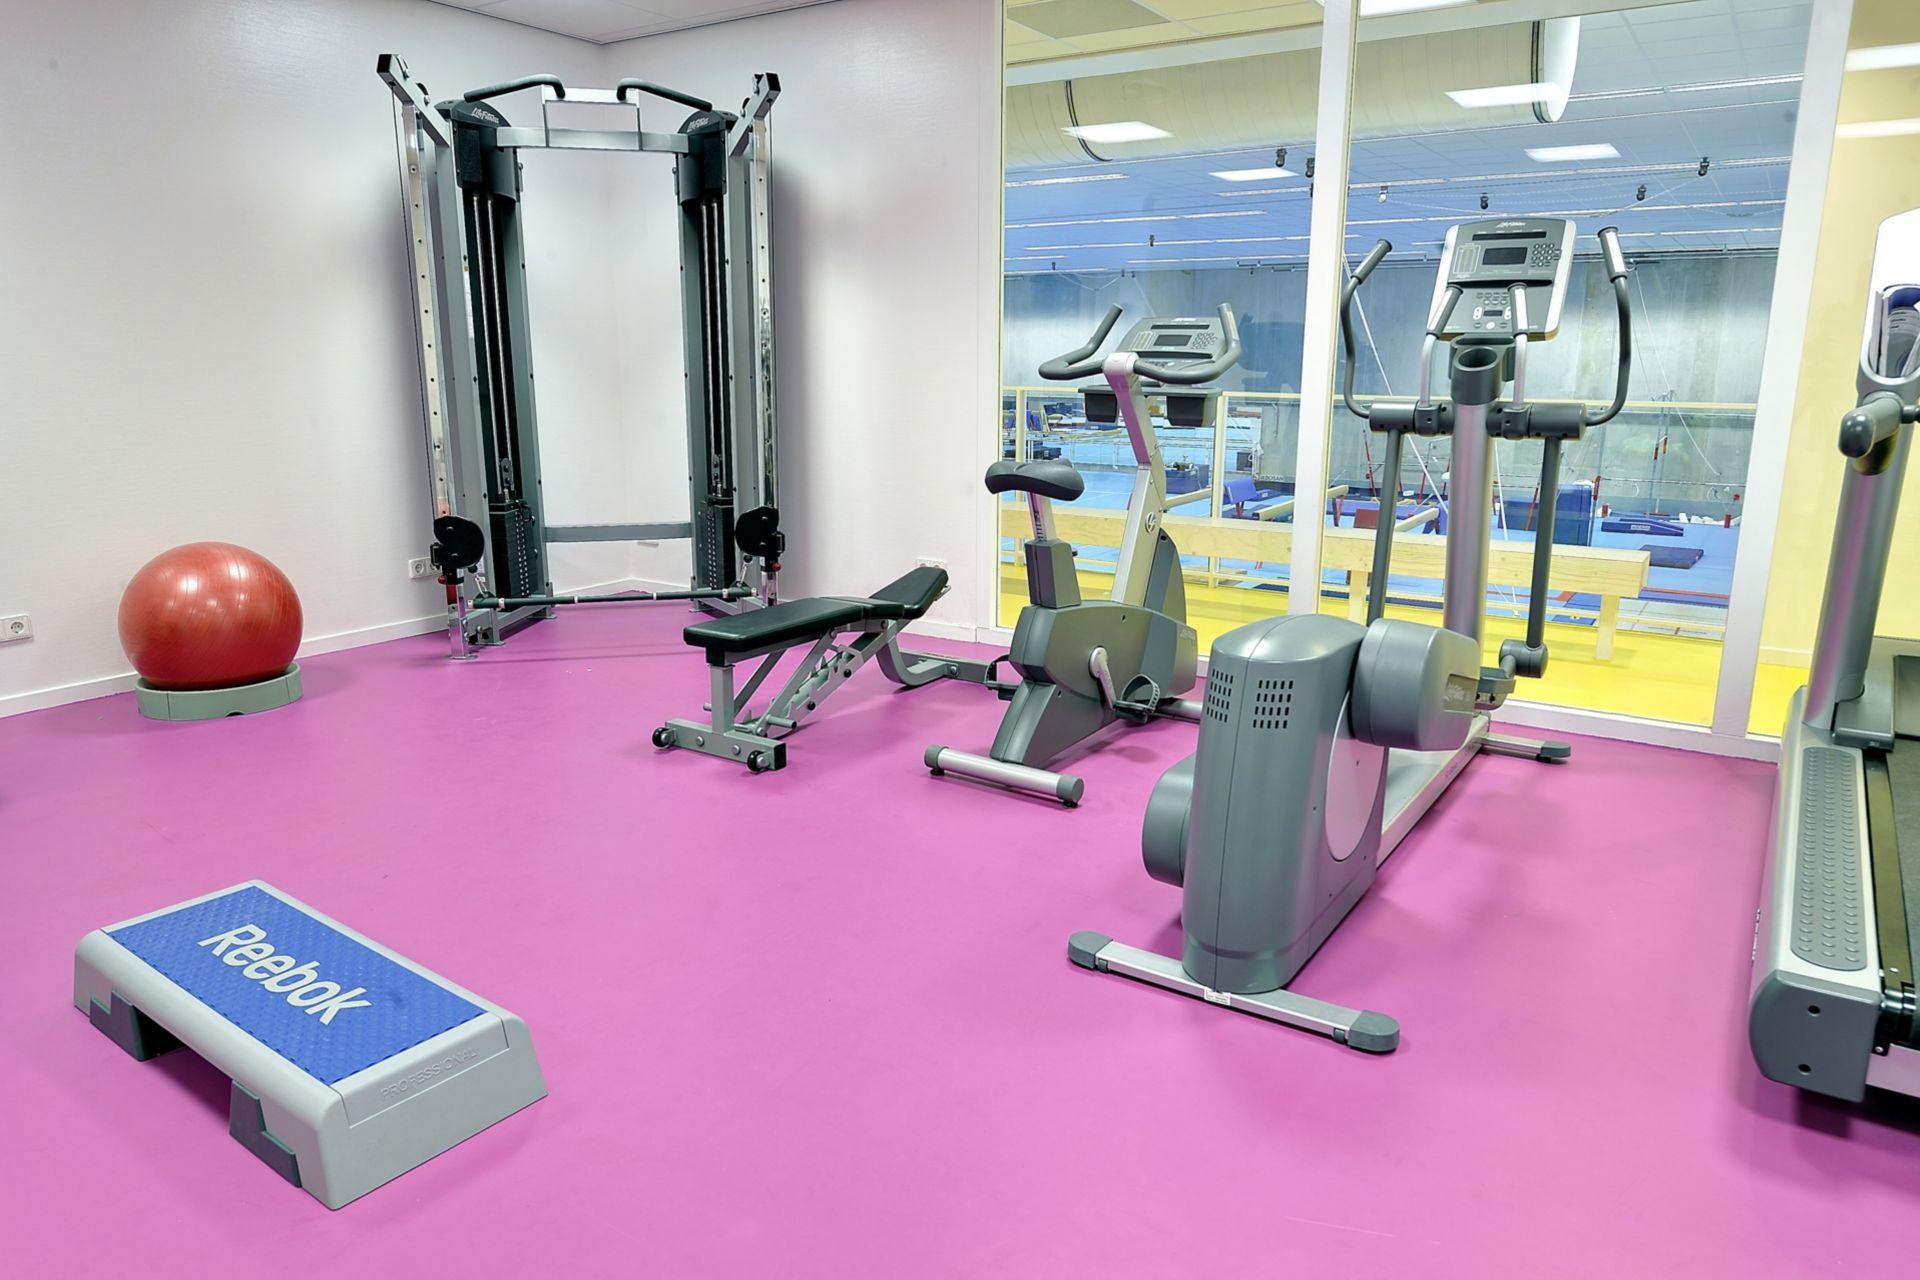 Sika ComfortFloor® pink floor in fitness room gym workout machines